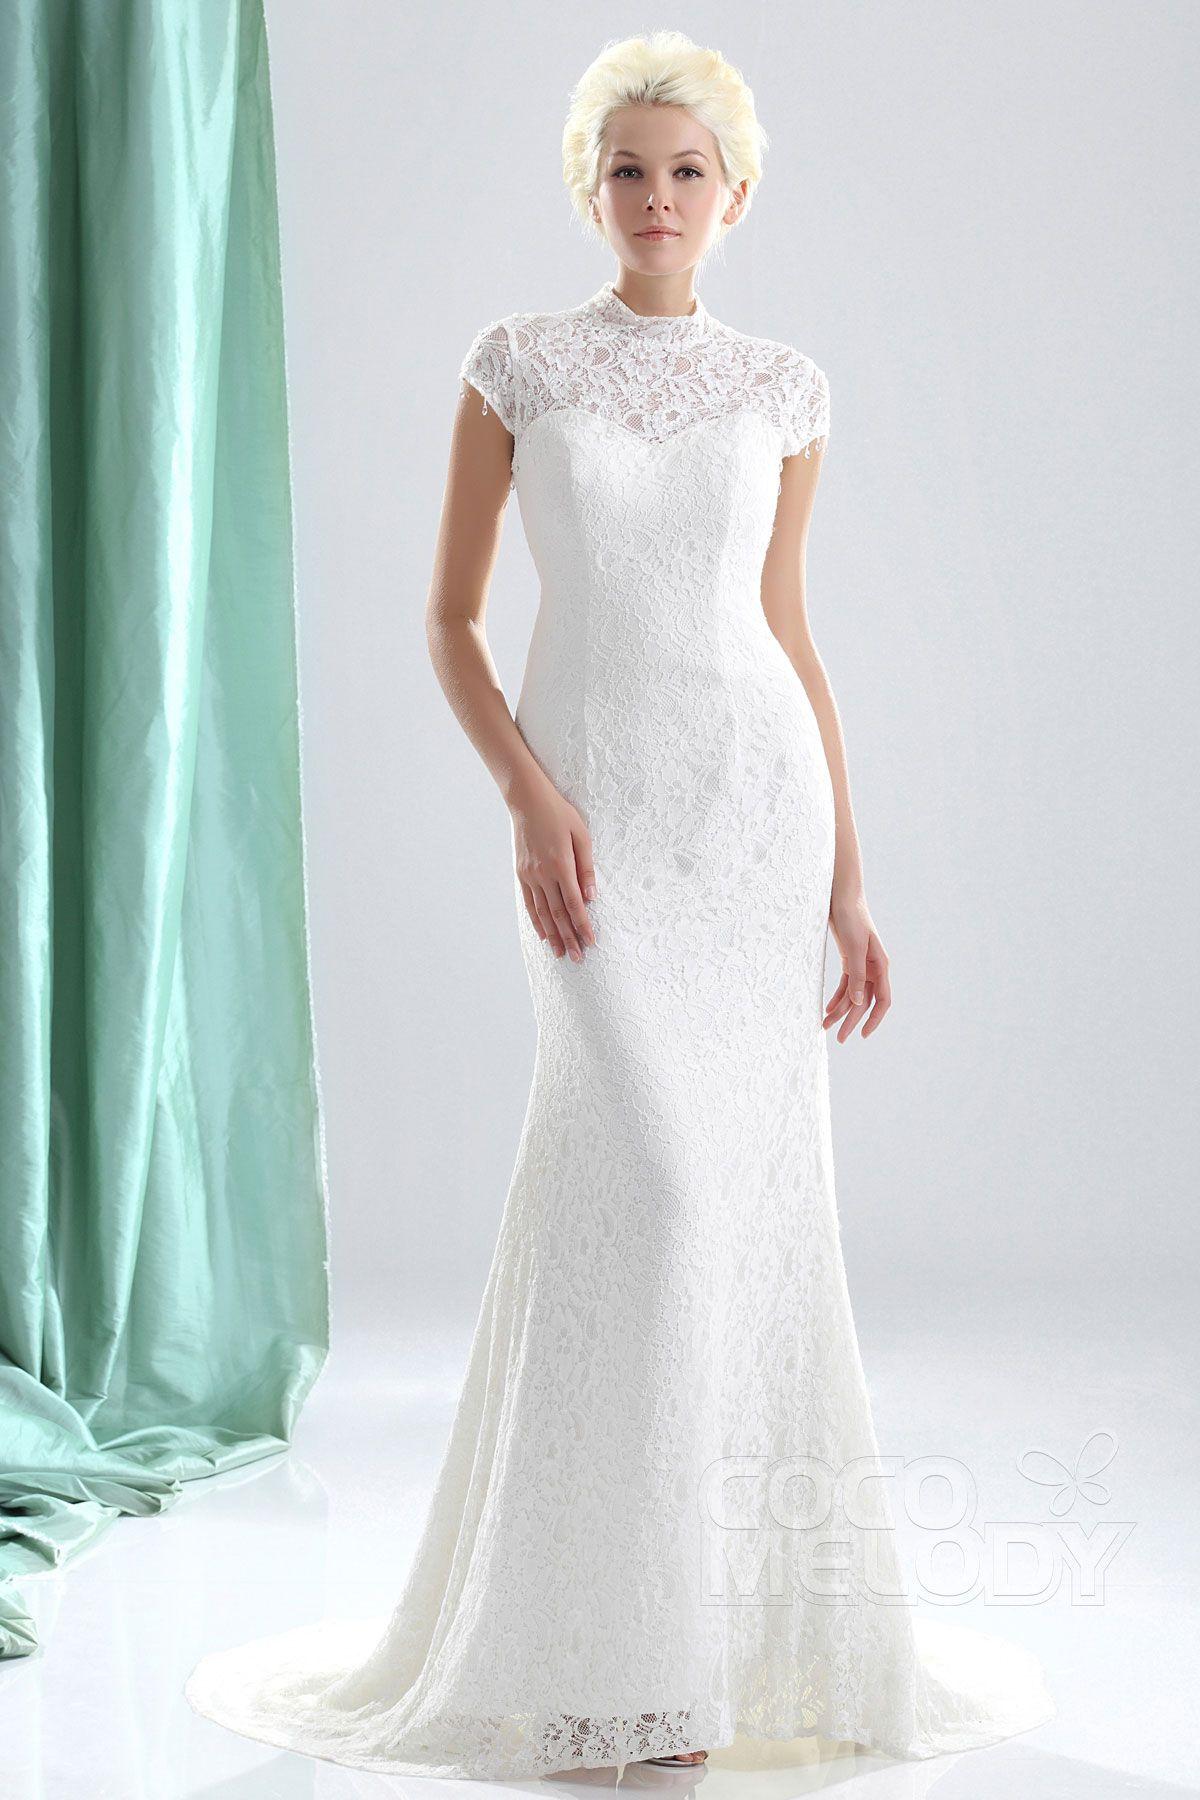 Perfect sheathcolumn high neck court train lace wedding dress